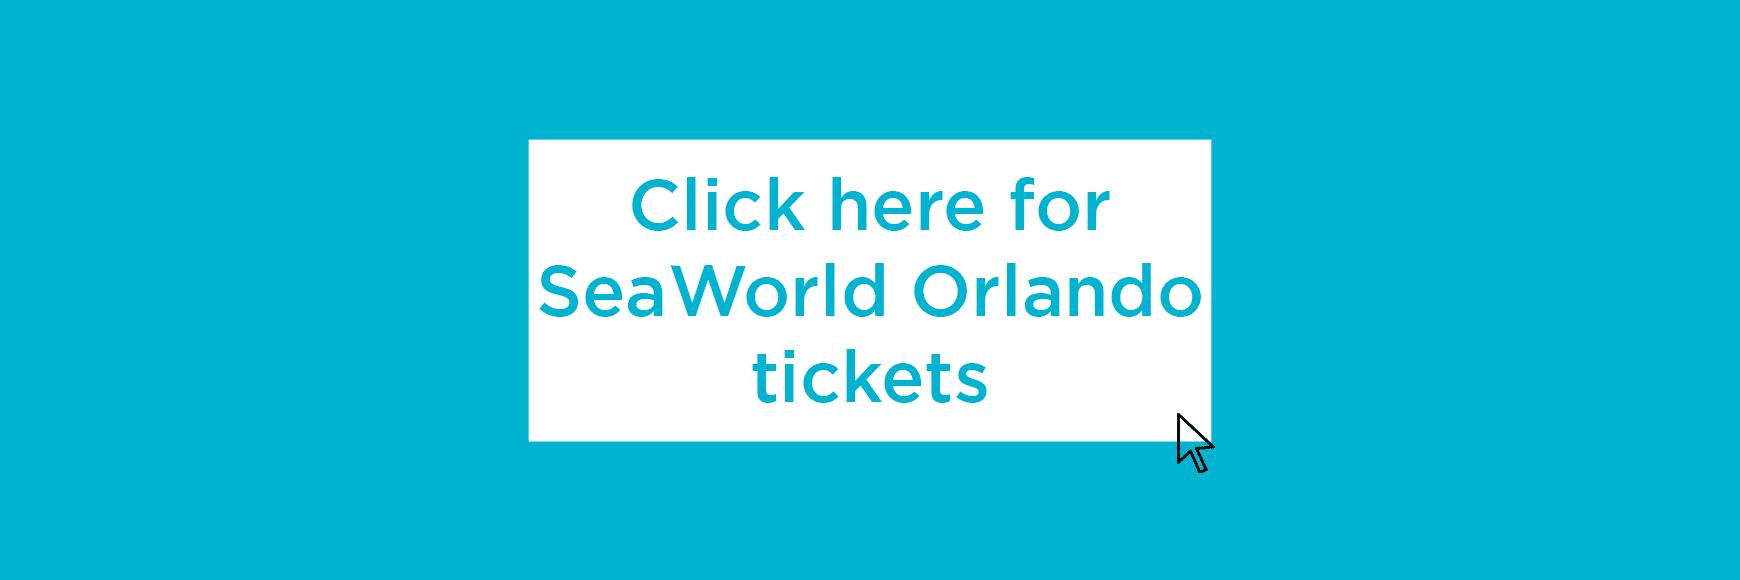 Seaworld tickets banner